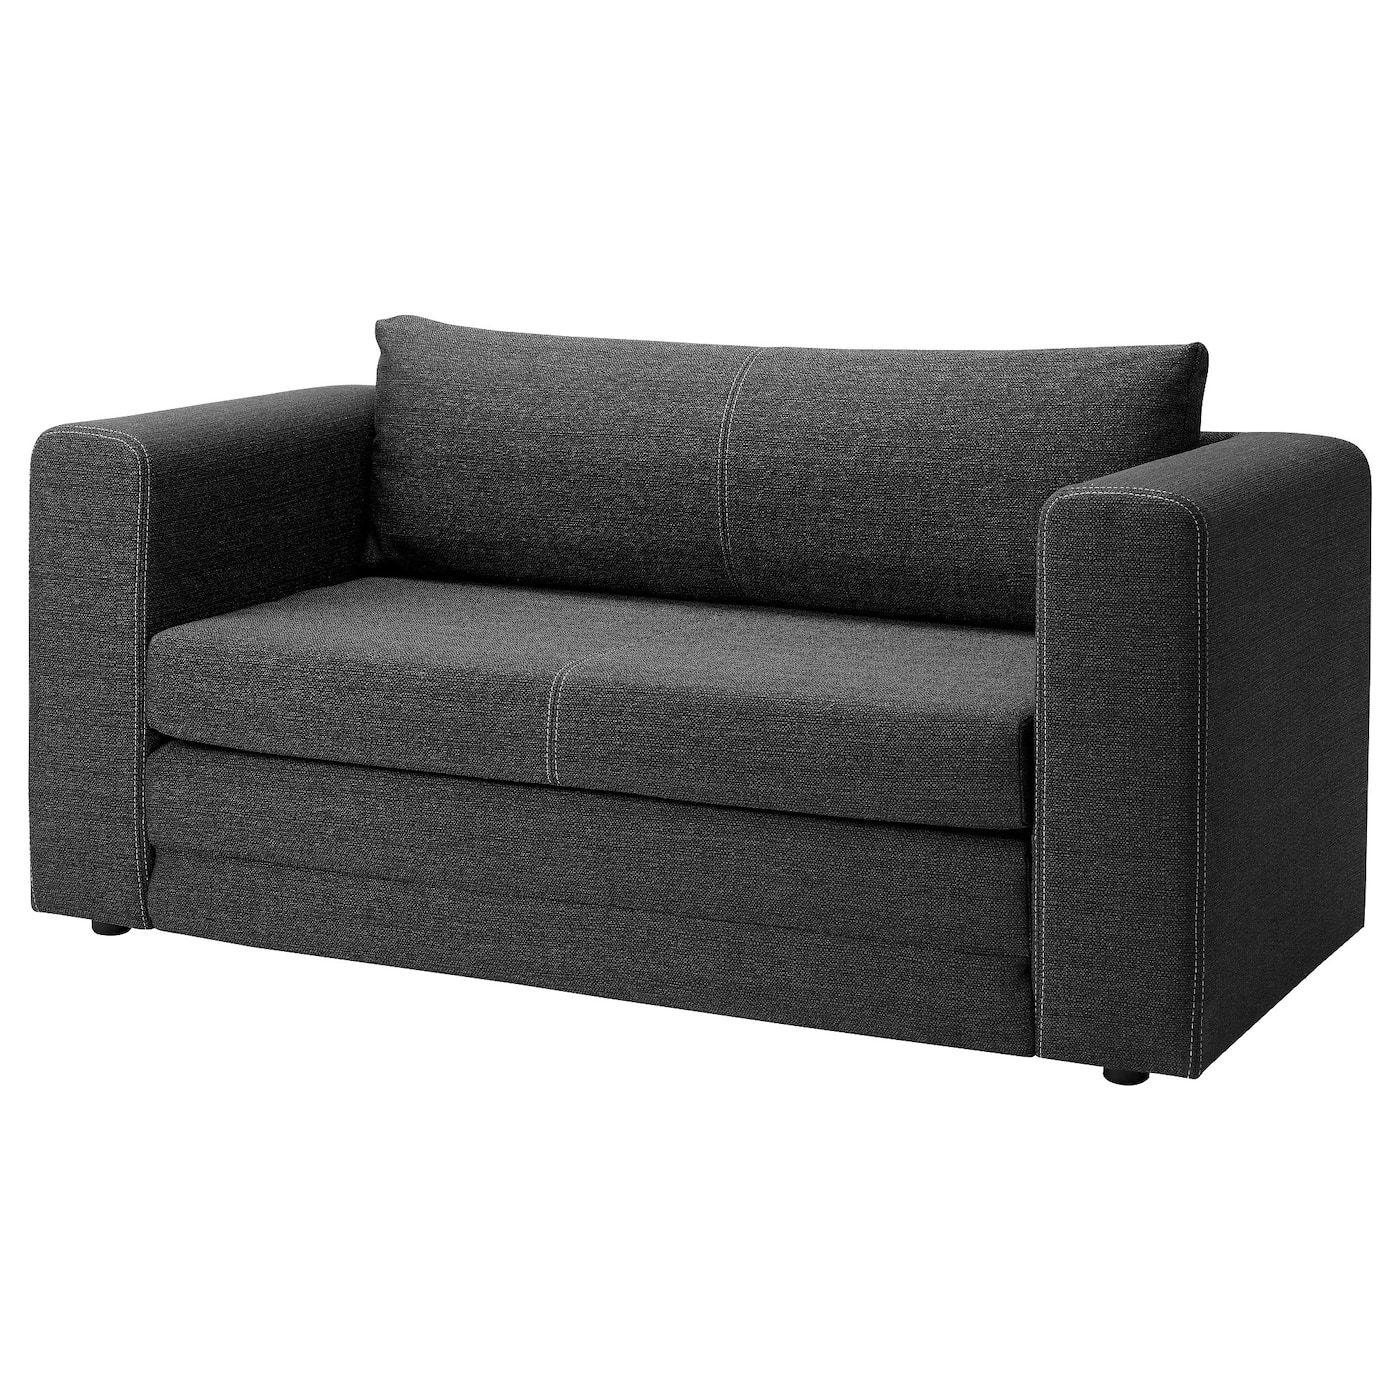 2 Zits Bedbank.Askeby 2 Zits Slaapbank Grijs In 2020 Ikea Sofa Sofa Small Couch